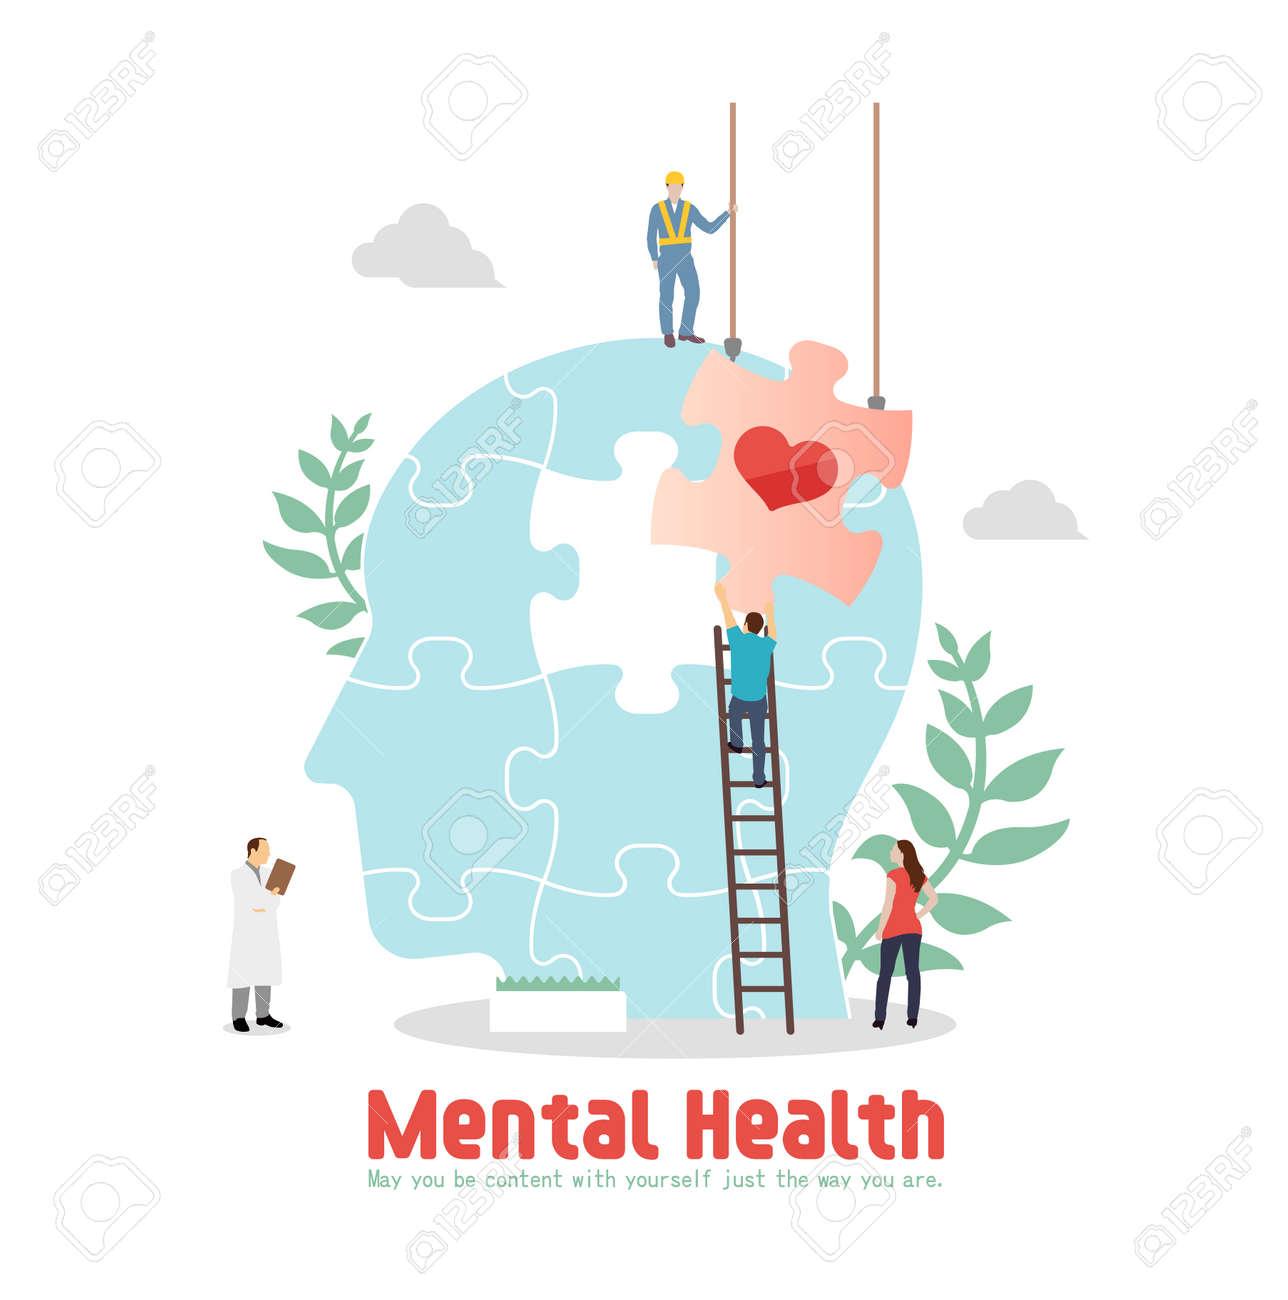 Mental health concept flat vector illustration - 169249491